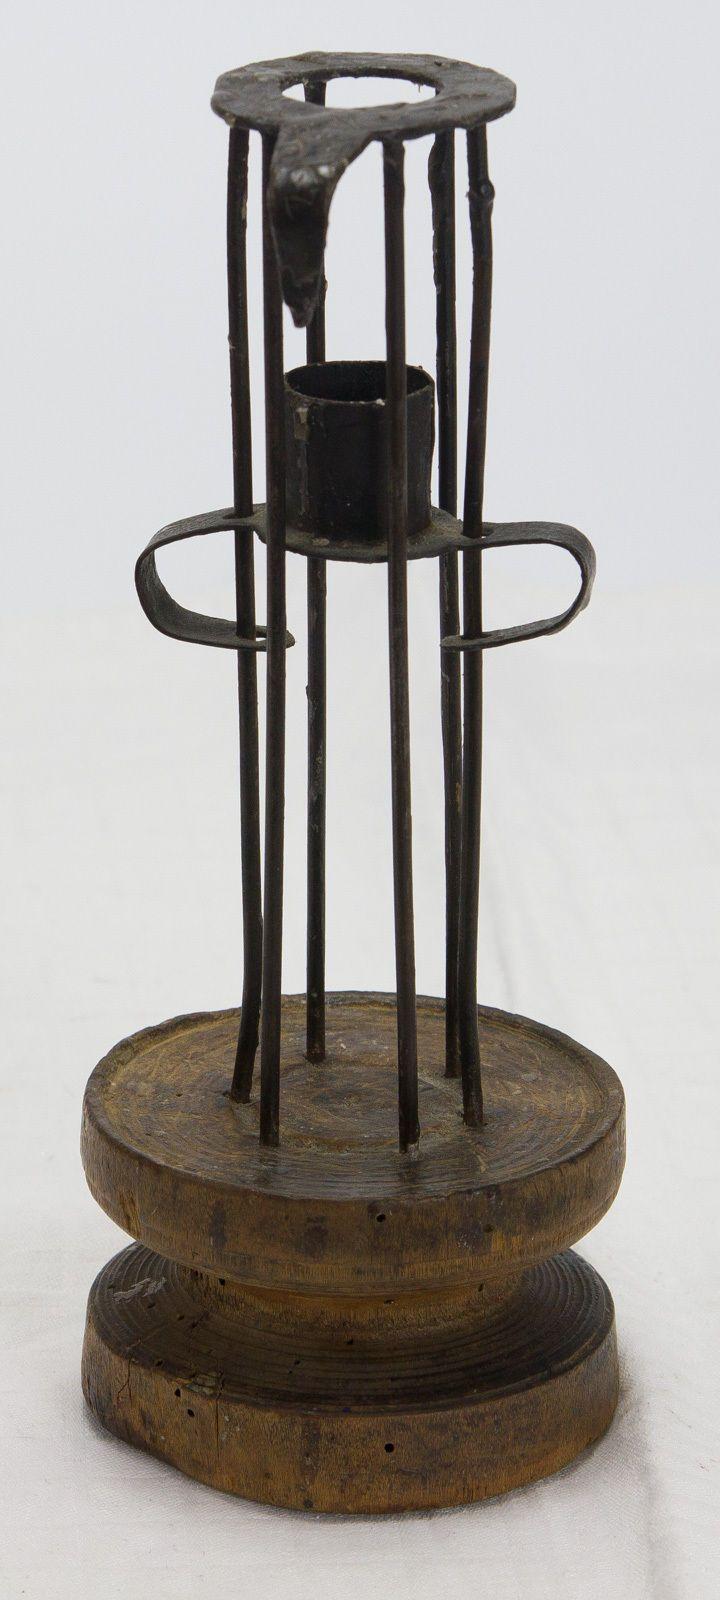 Antiker Kerzenleuchter Eisen Barock 17 18 Jhd candlestick iron 17th Monogramm in Antiquitäten &